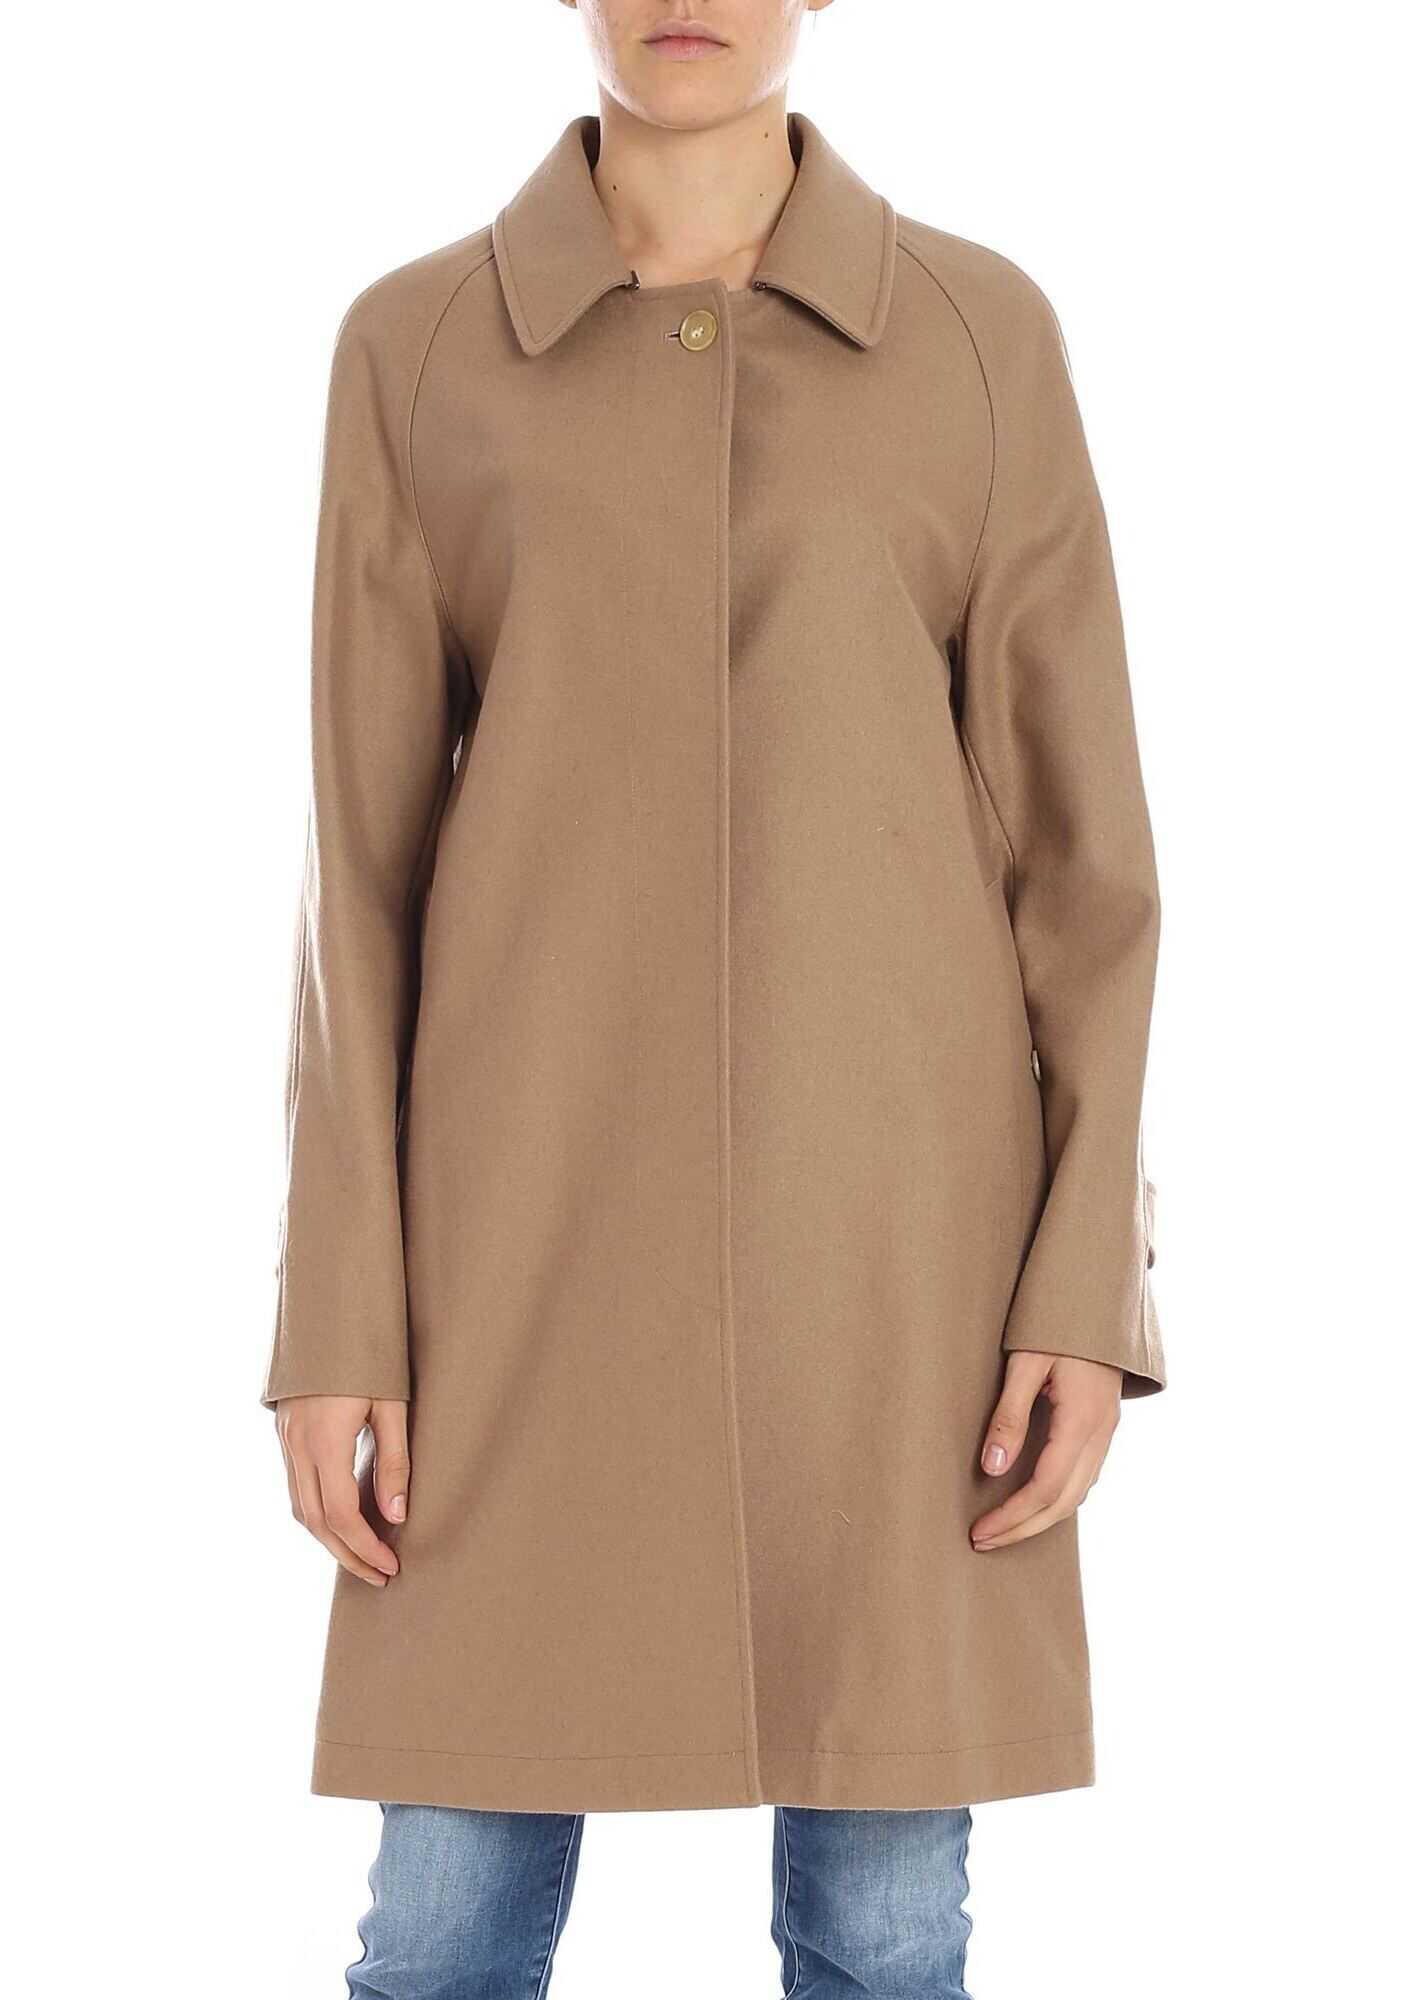 """Camden"" Camel-Color Cashmere Coat"